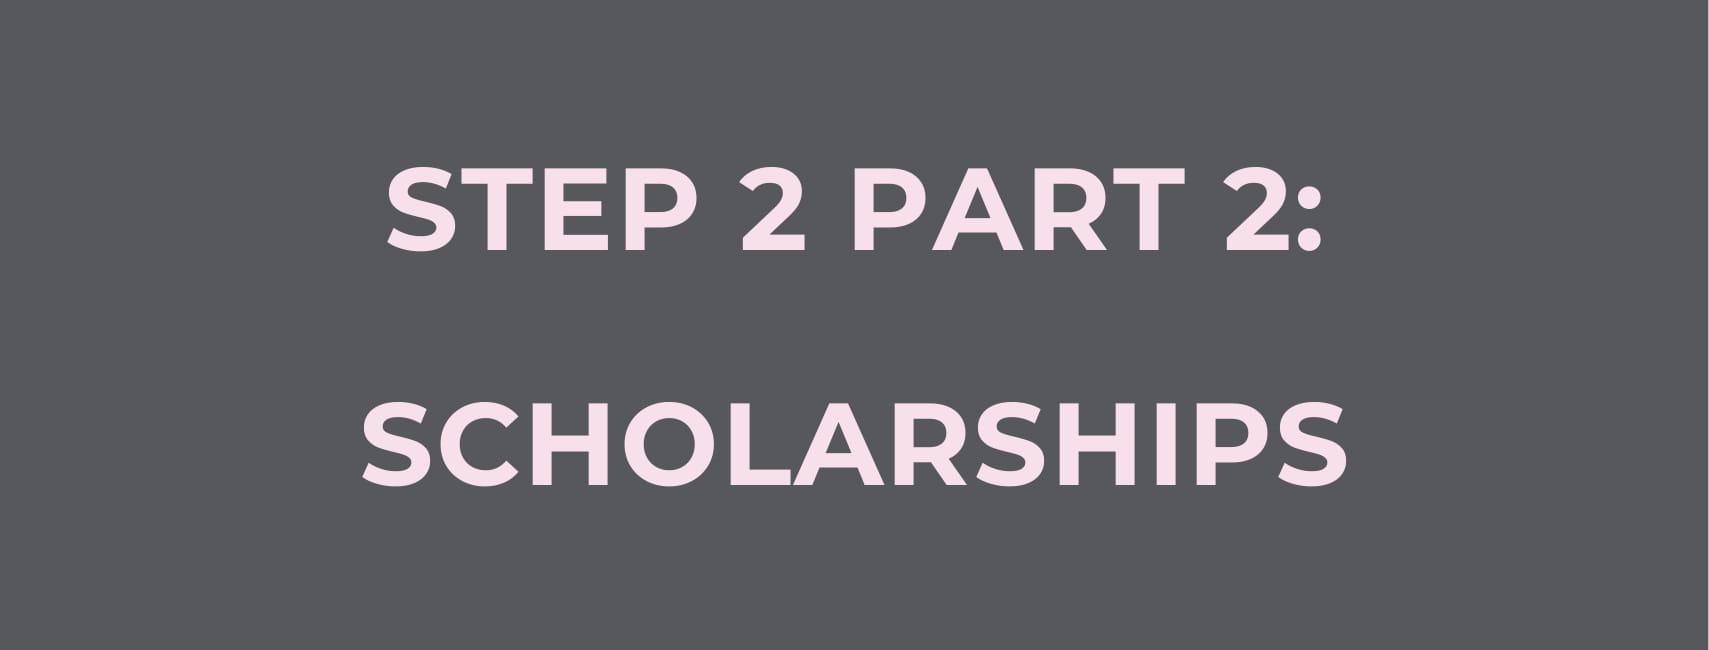 Scholarships Step 2 Part 2 (1)-1.jpg